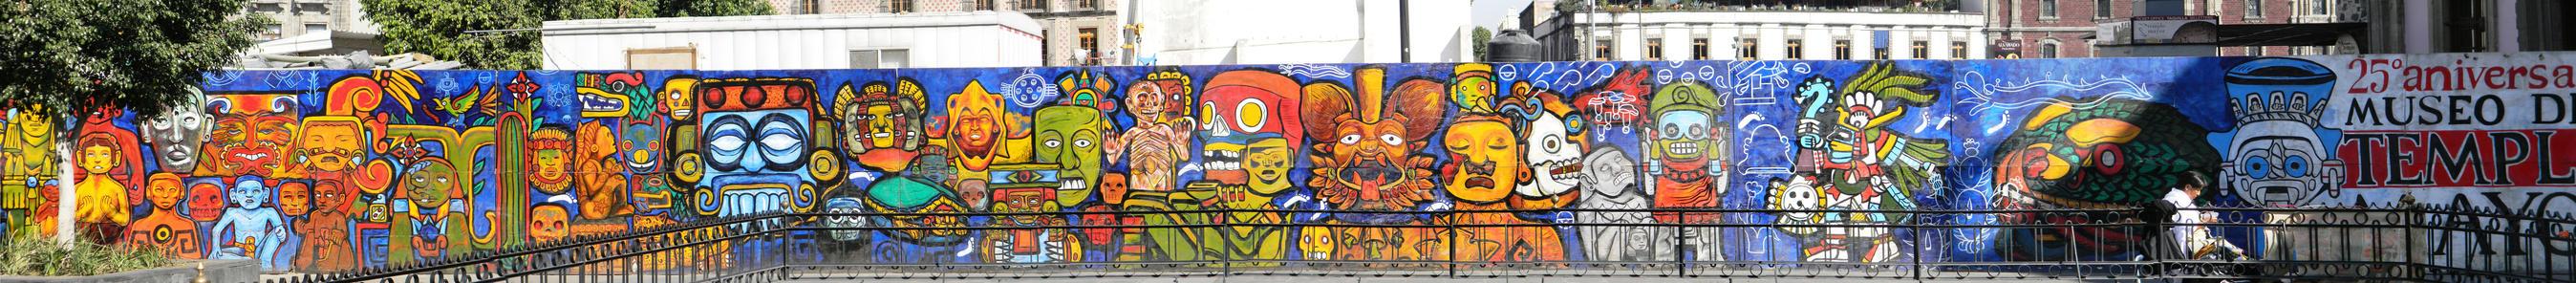 Mexico City Mural by CrimsonCape